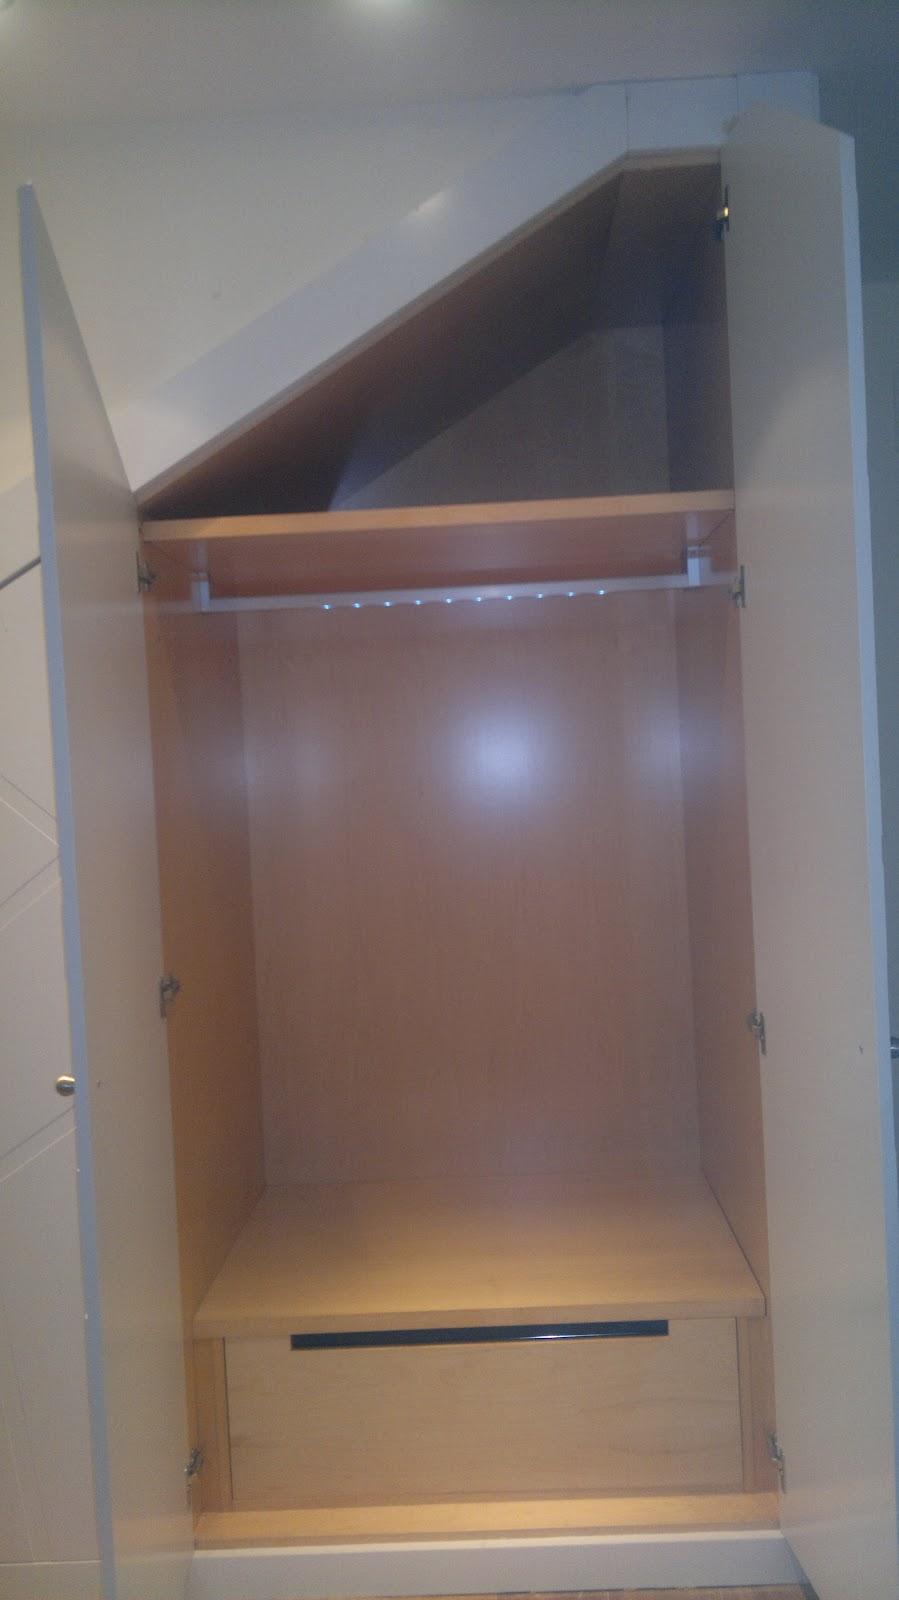 Ebanisteria carpinteria manuel perez zaragoza armario for Armario escalera